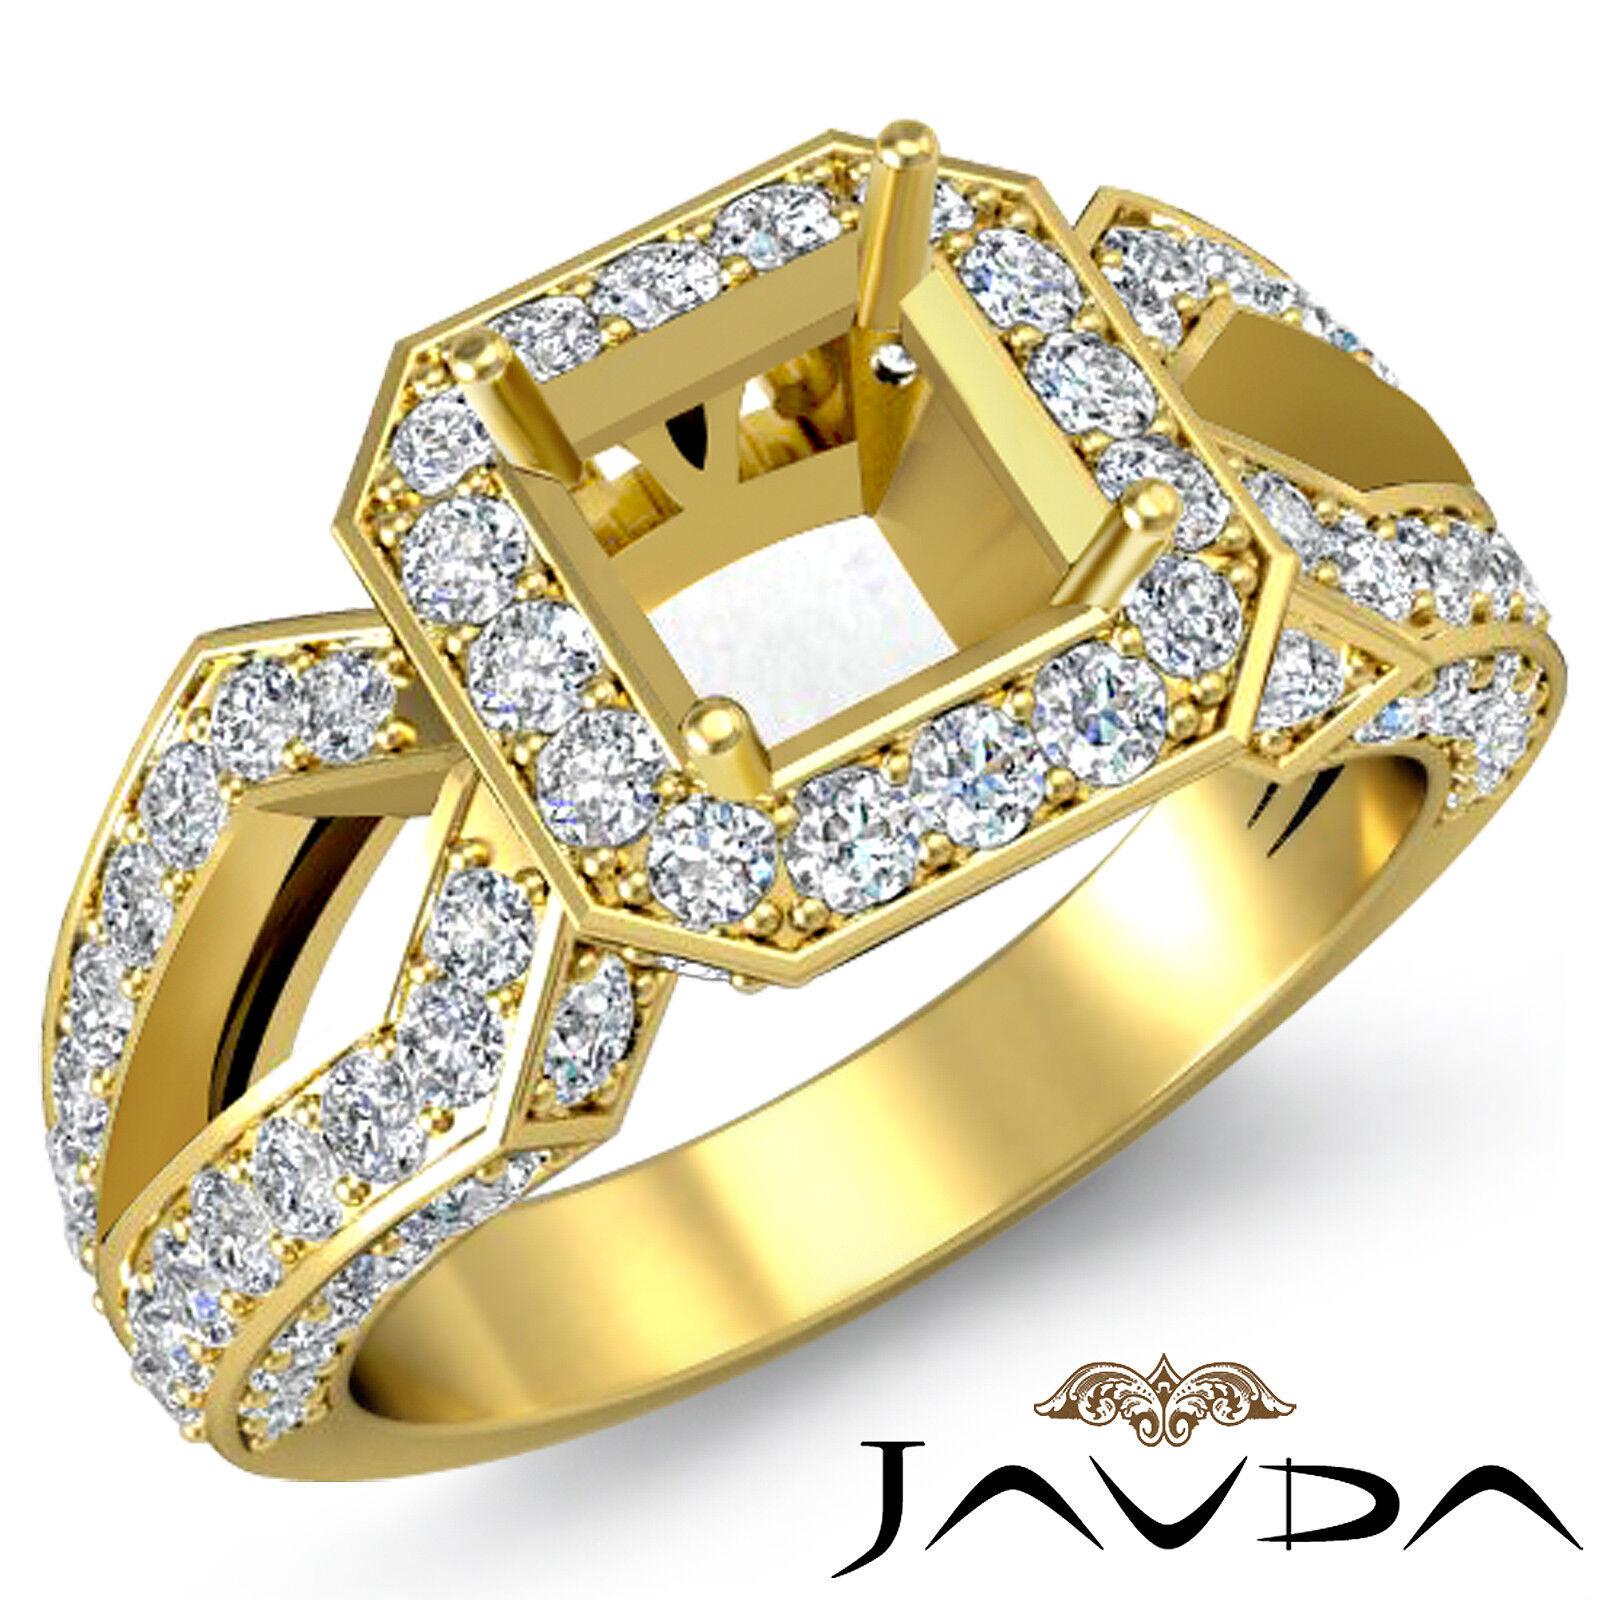 Diamond Engagement Filigree Ring Asscher Shape Semi Mount 14k Yellow gold 1.4Ct